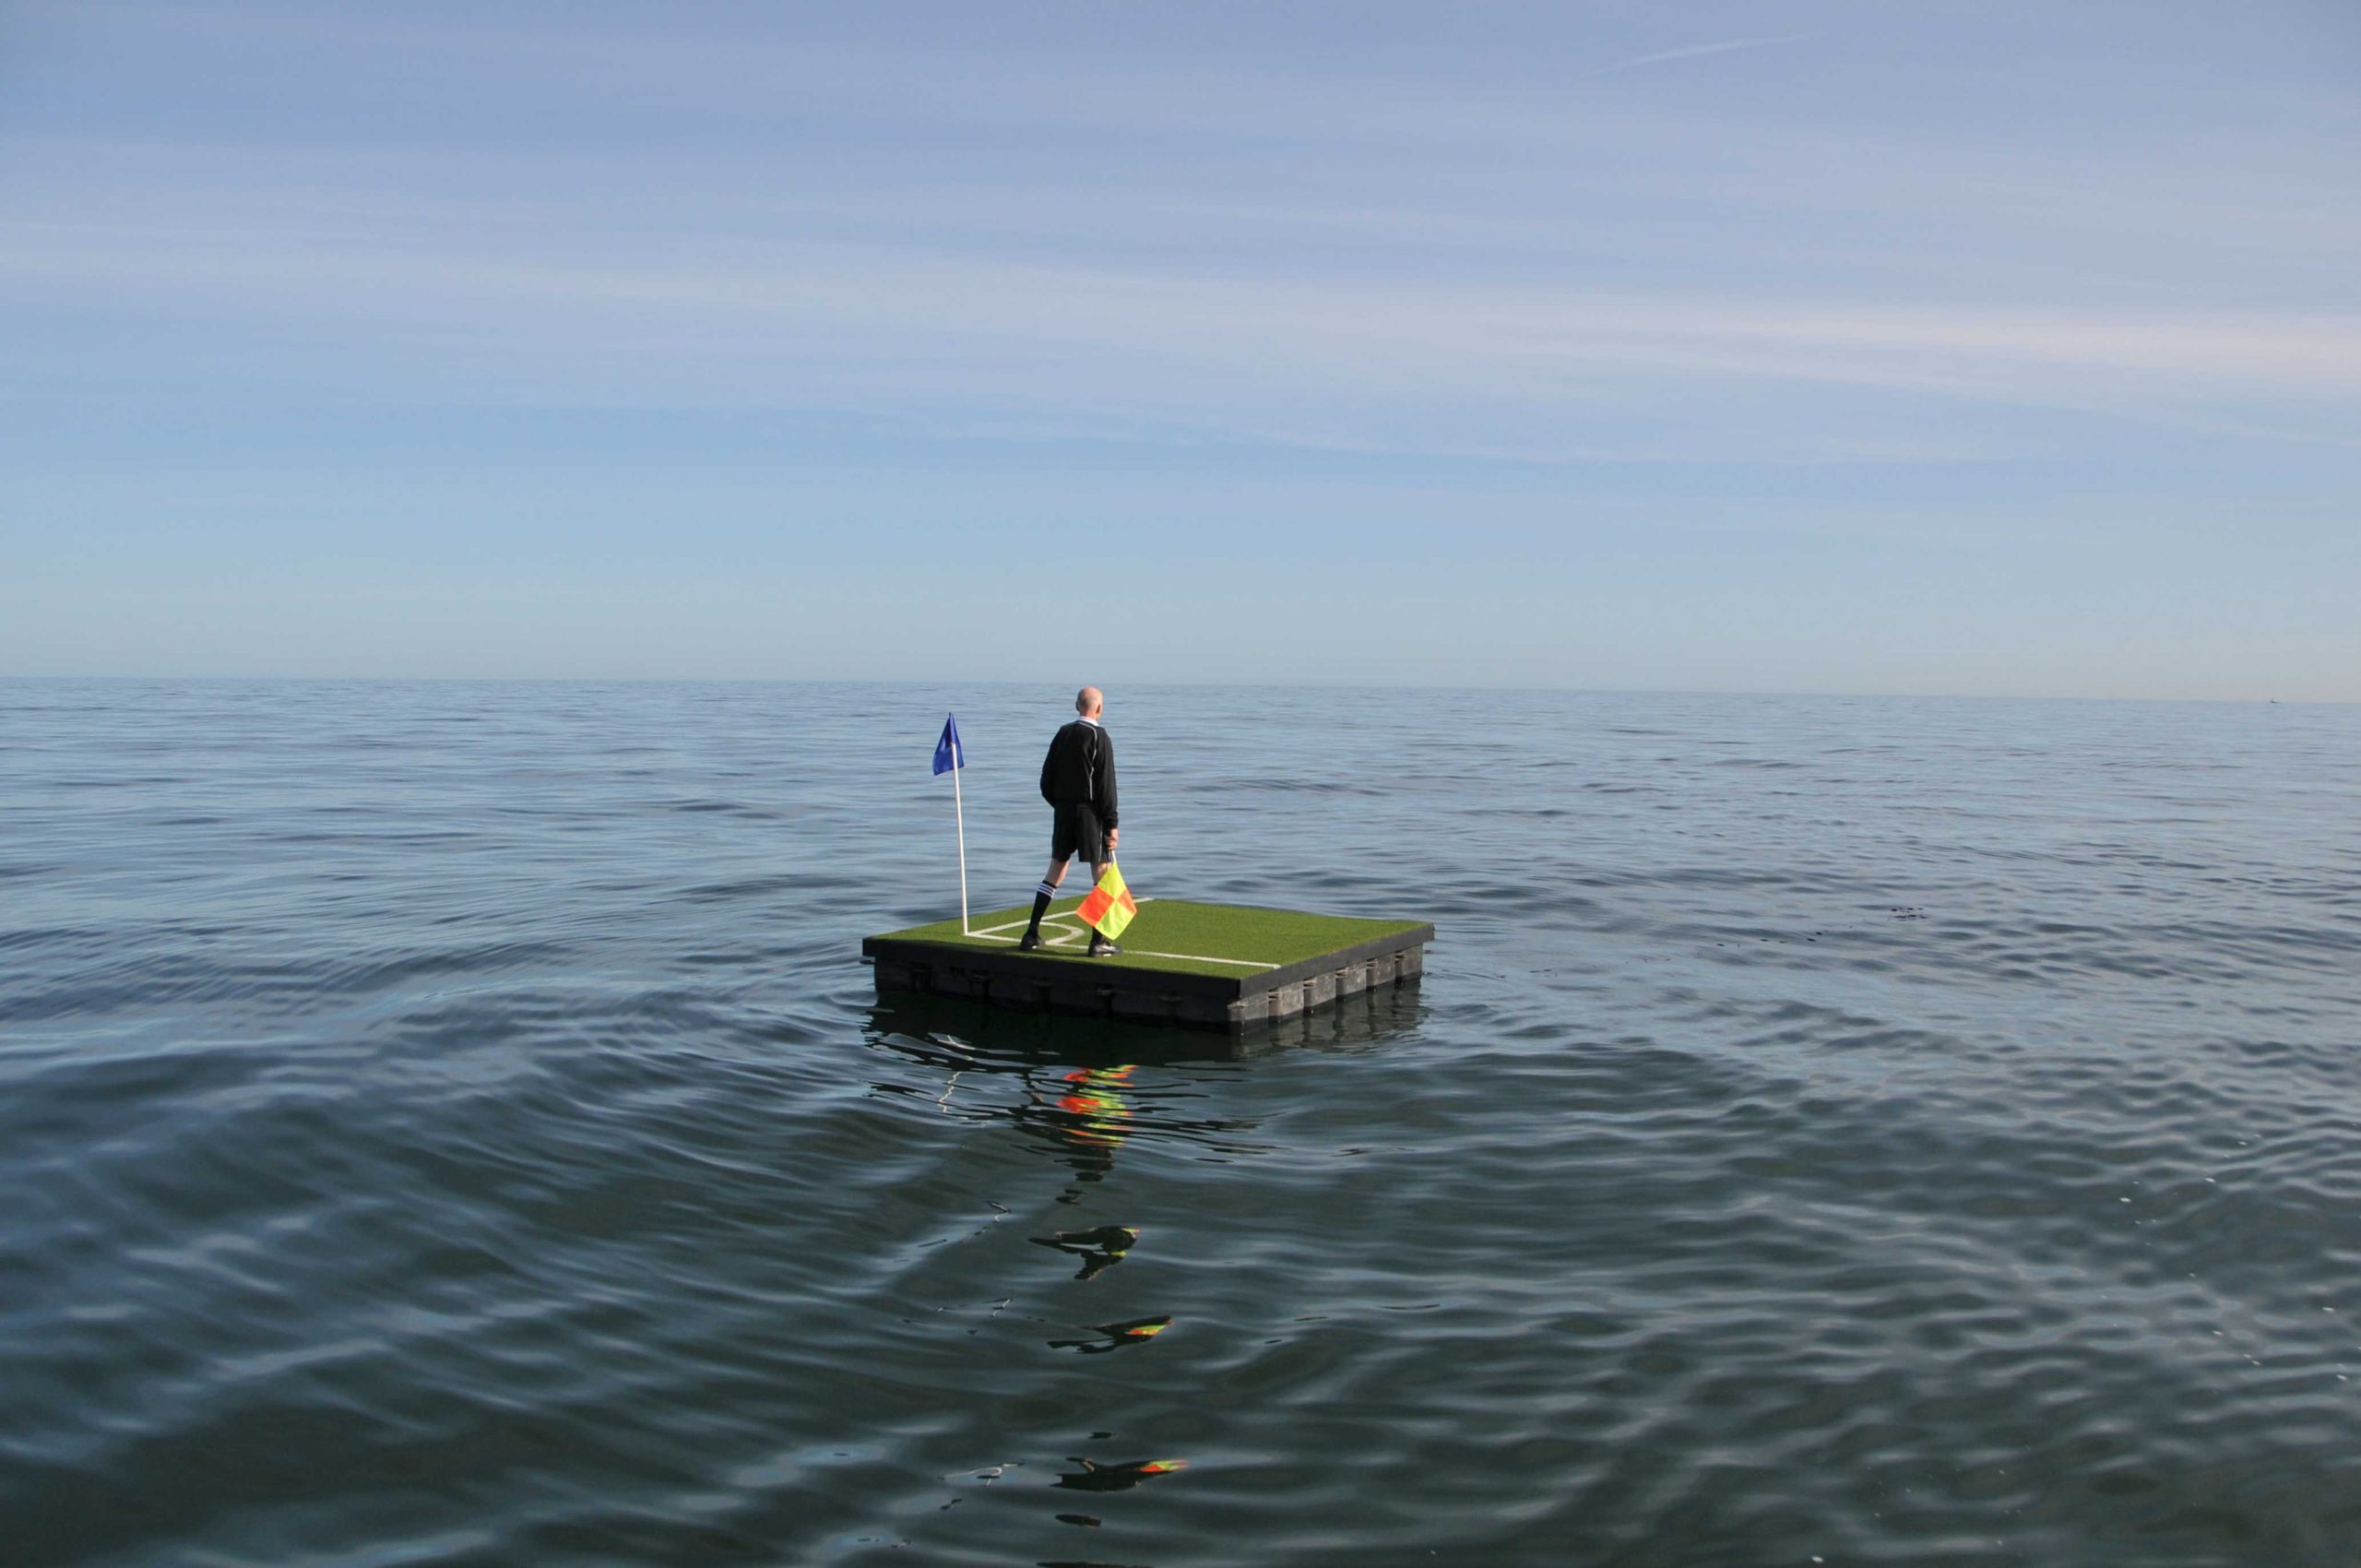 'Mare Liberum' (freedom of the sea) Copyright 2009 Jason Minsky (2)